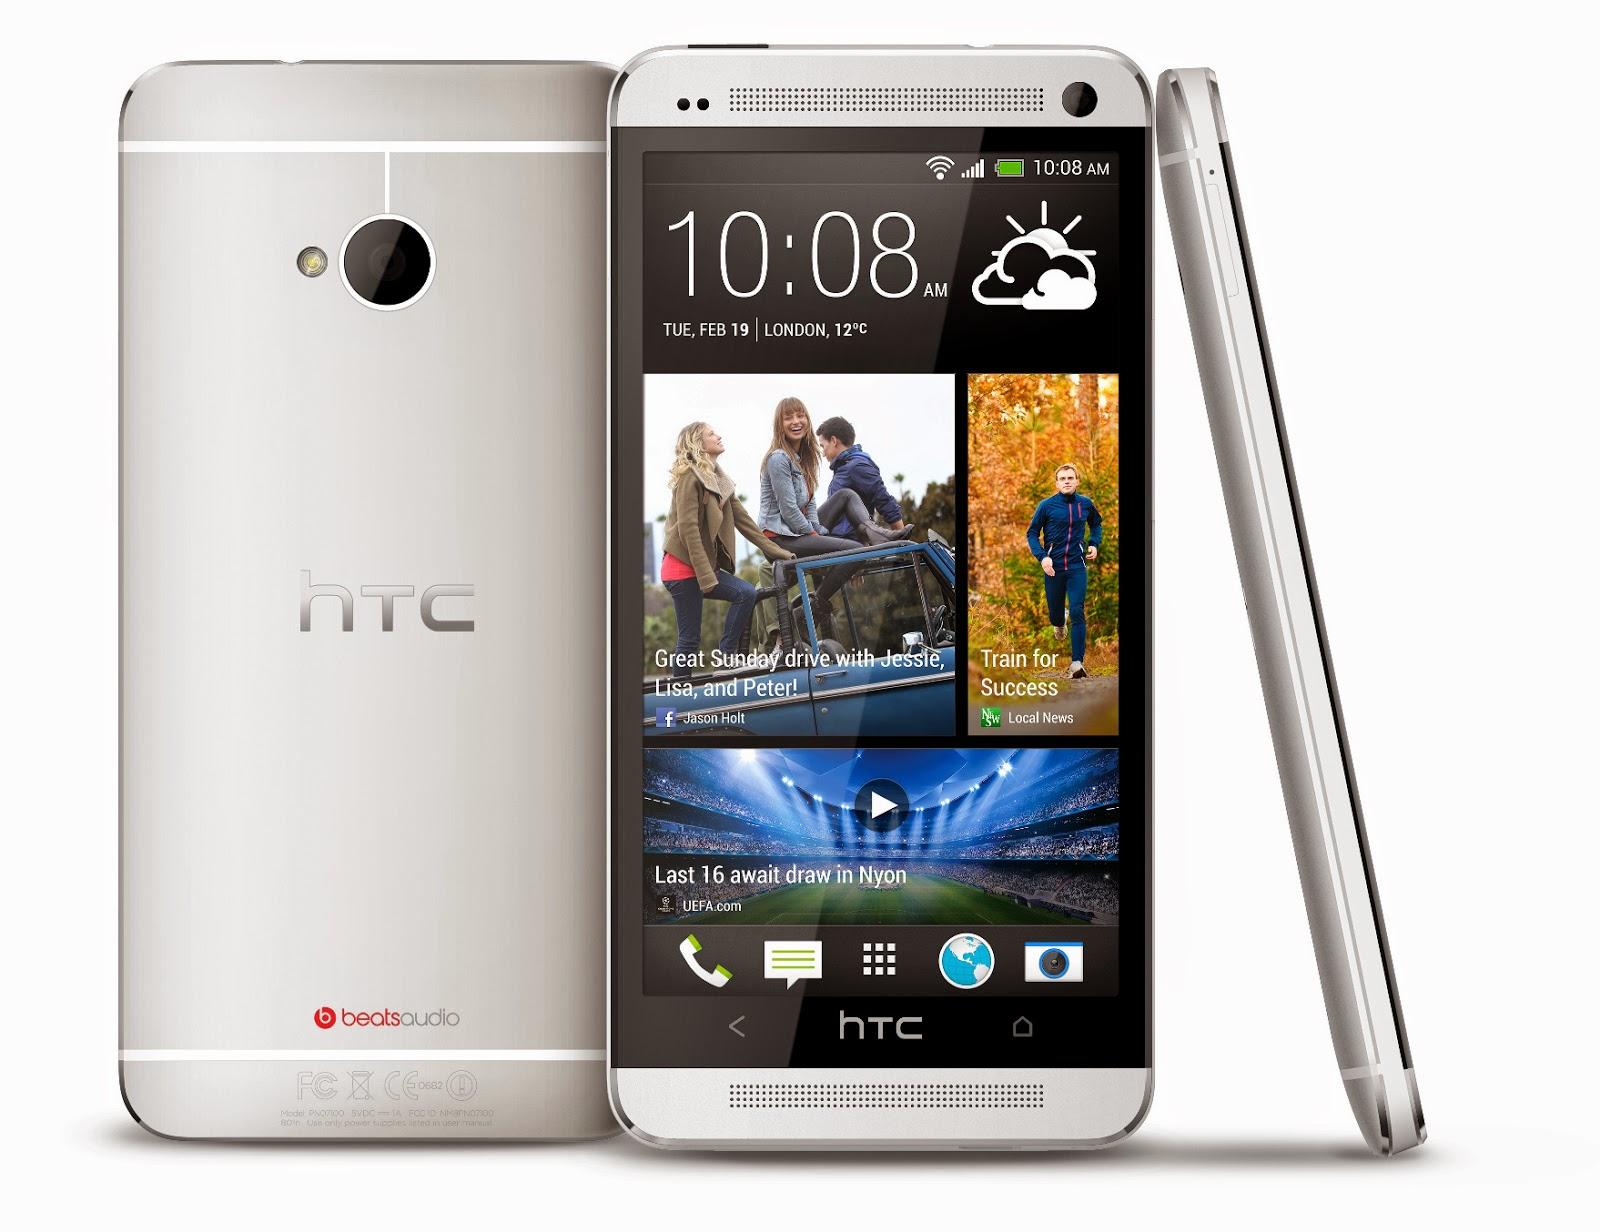 Spesifikasi Dan Harga HTC One X / HTC One XT